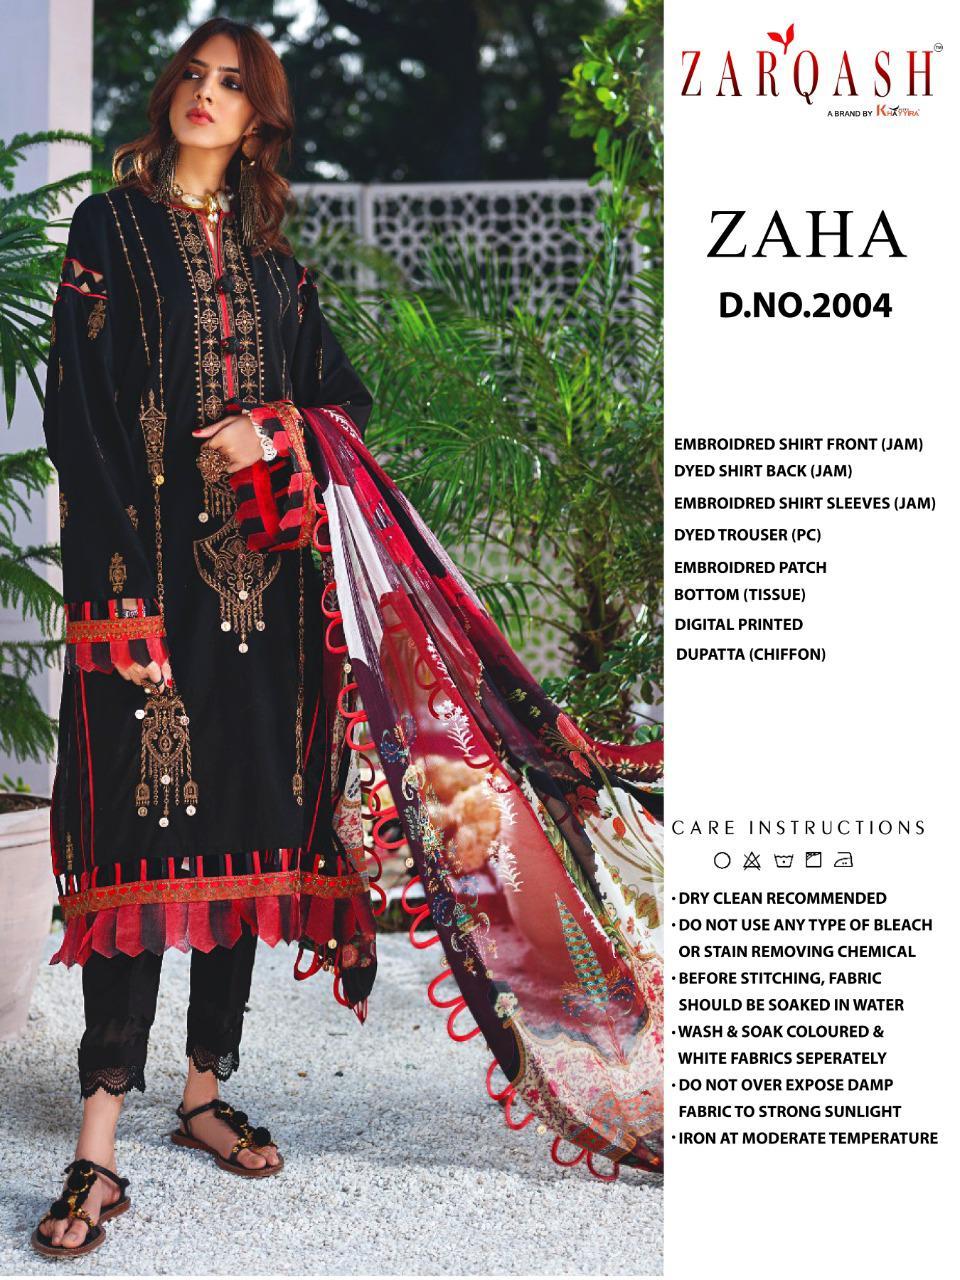 Zarqash Zaha by Khayyira Salwar Suit Wholesale Catalog 4 Pcs 1 - Zarqash Zaha by Khayyira Salwar Suit Wholesale Catalog 4 Pcs